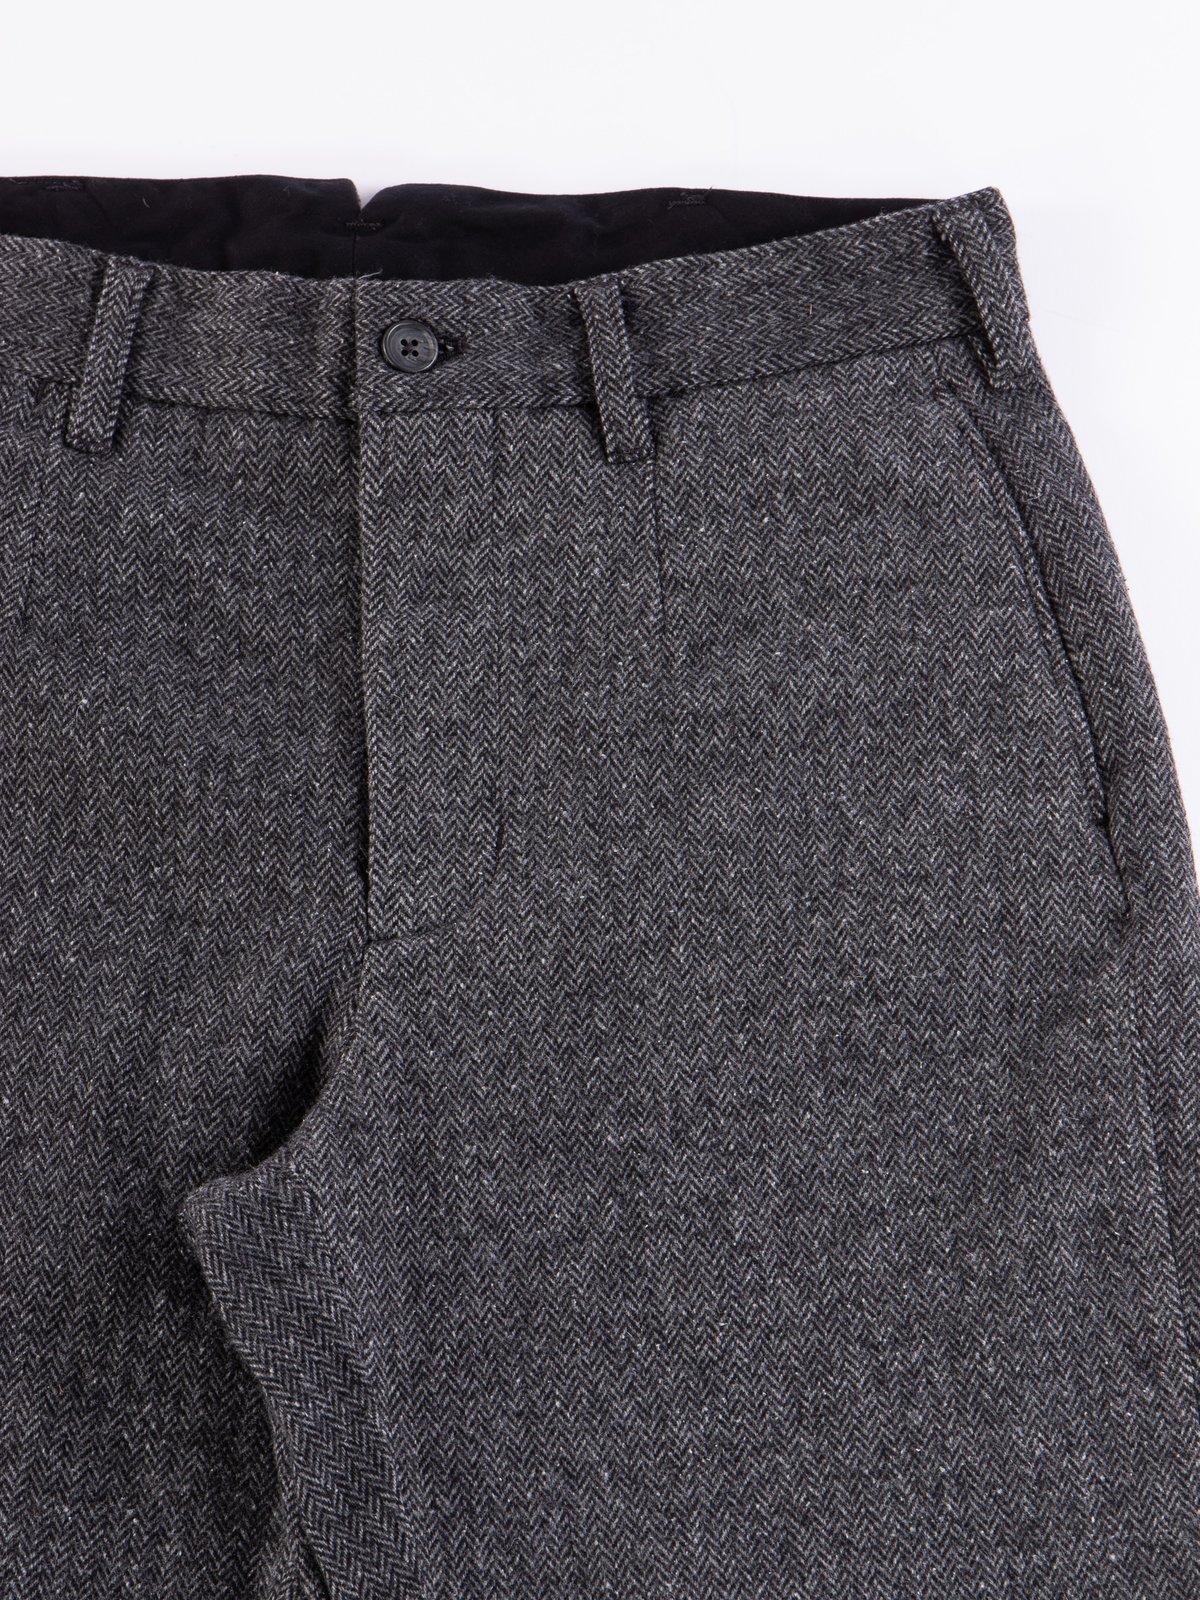 Grey Poly Wool Herringbone Andover Pant - Image 4